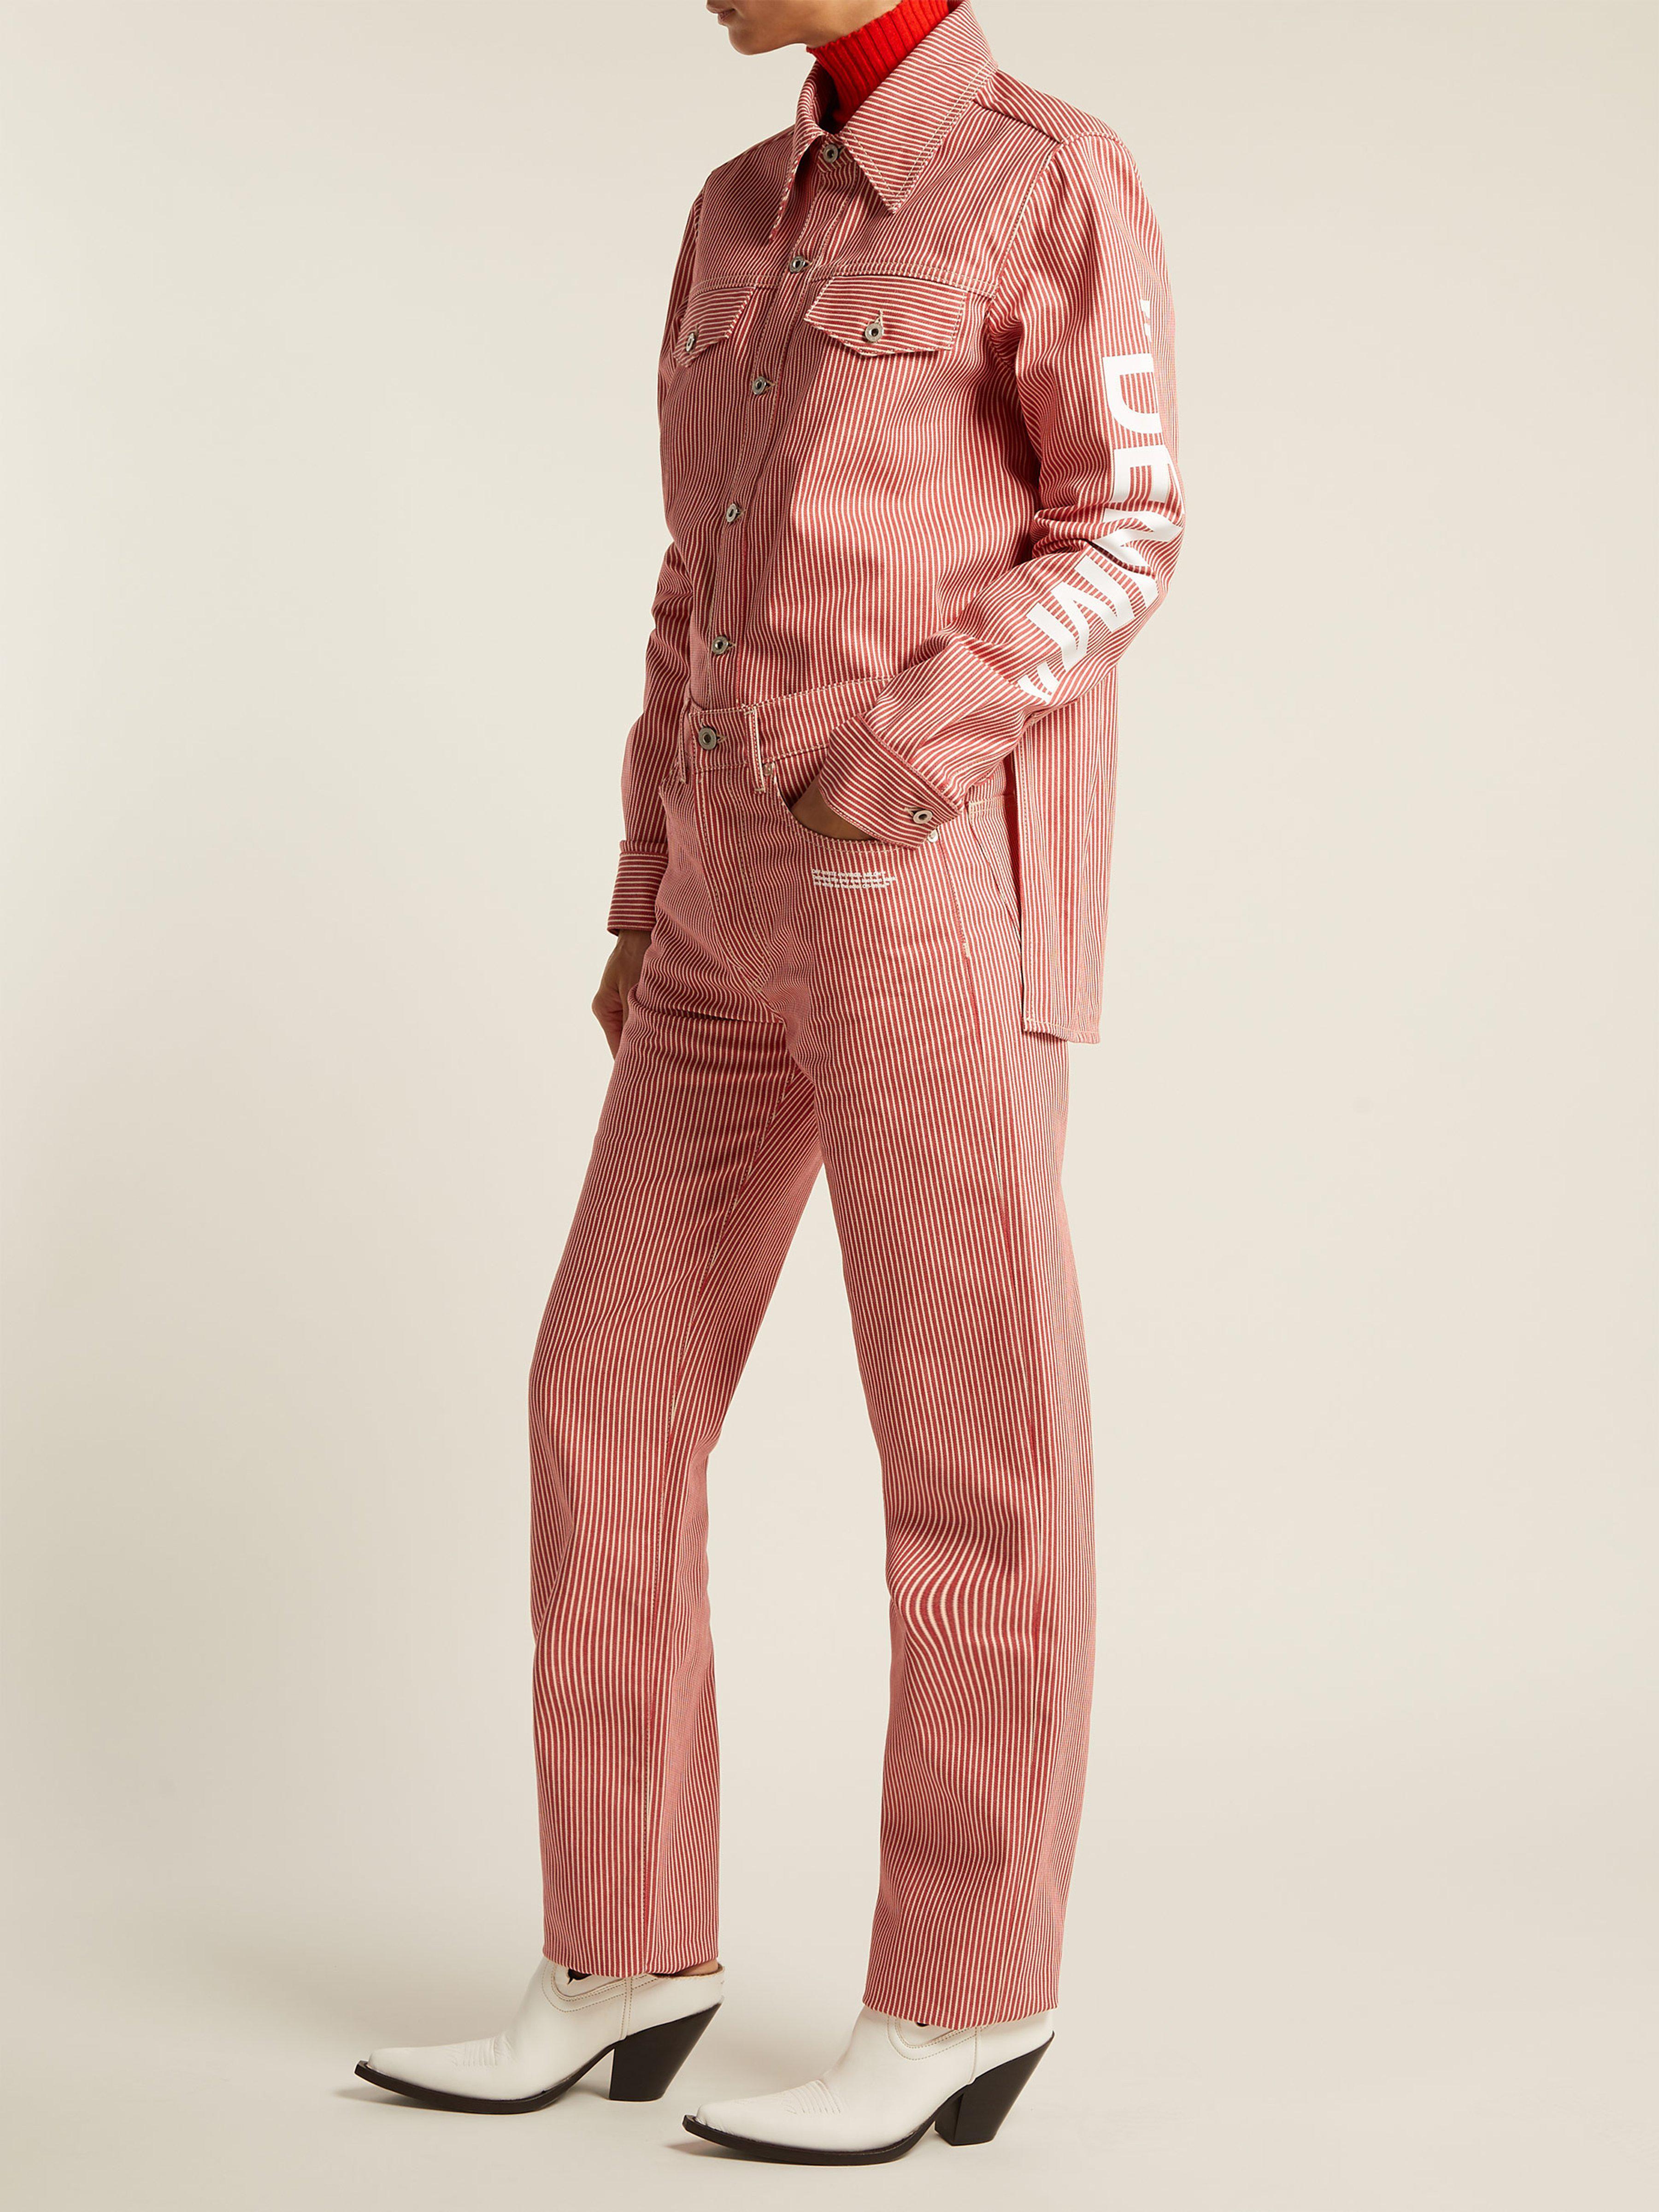 a7010d2358bb Off-White c o Virgil Abloh - Red Striped High Rise Straight Leg Jeans. View  fullscreen